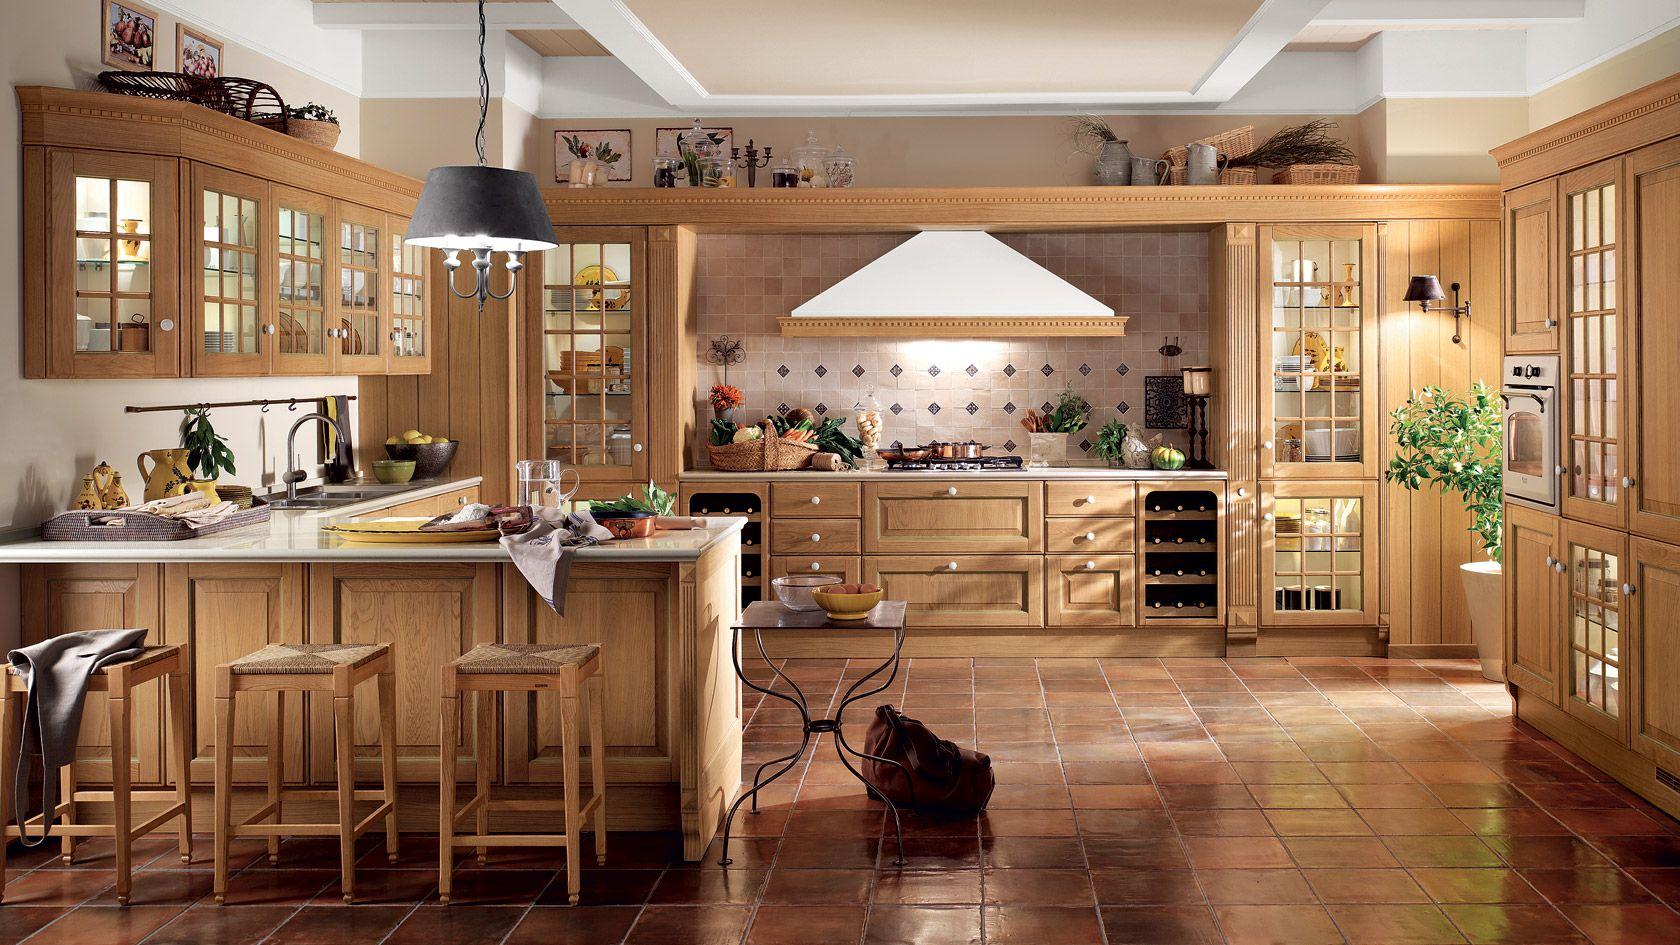 case rustiche moderne - cerca con google | home sweet home, Hause ideen